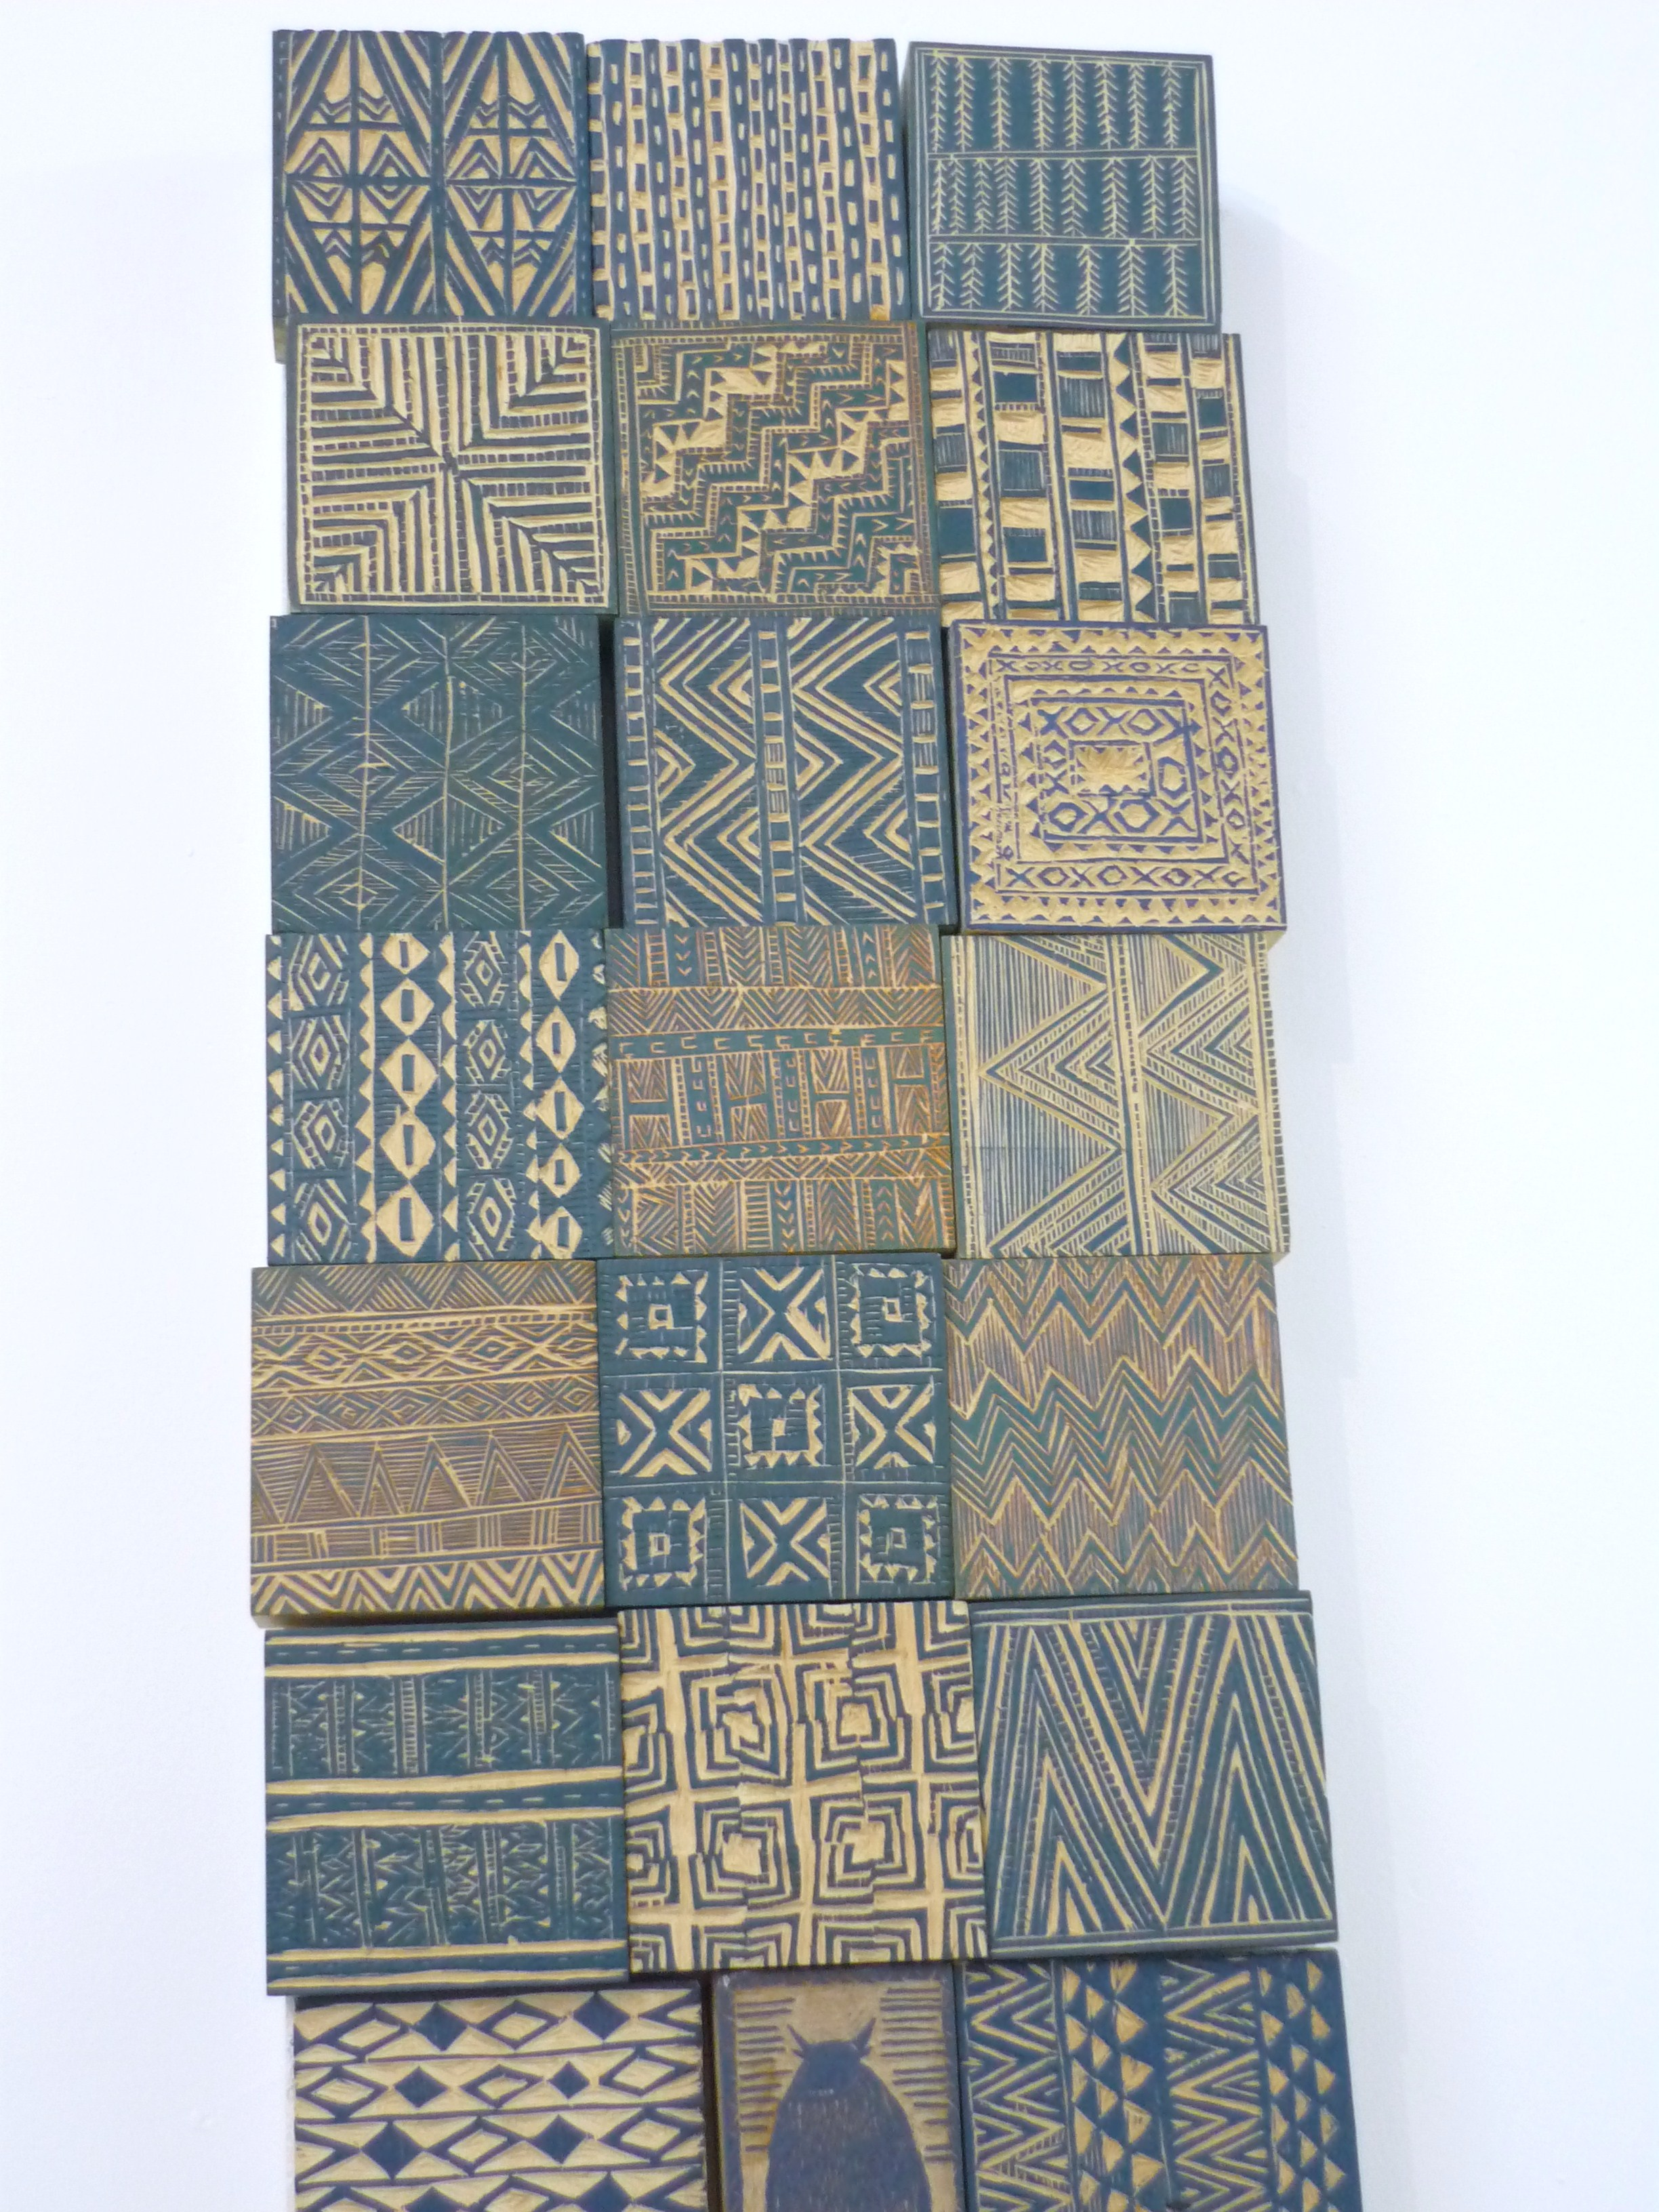 Wooden printing blocks.